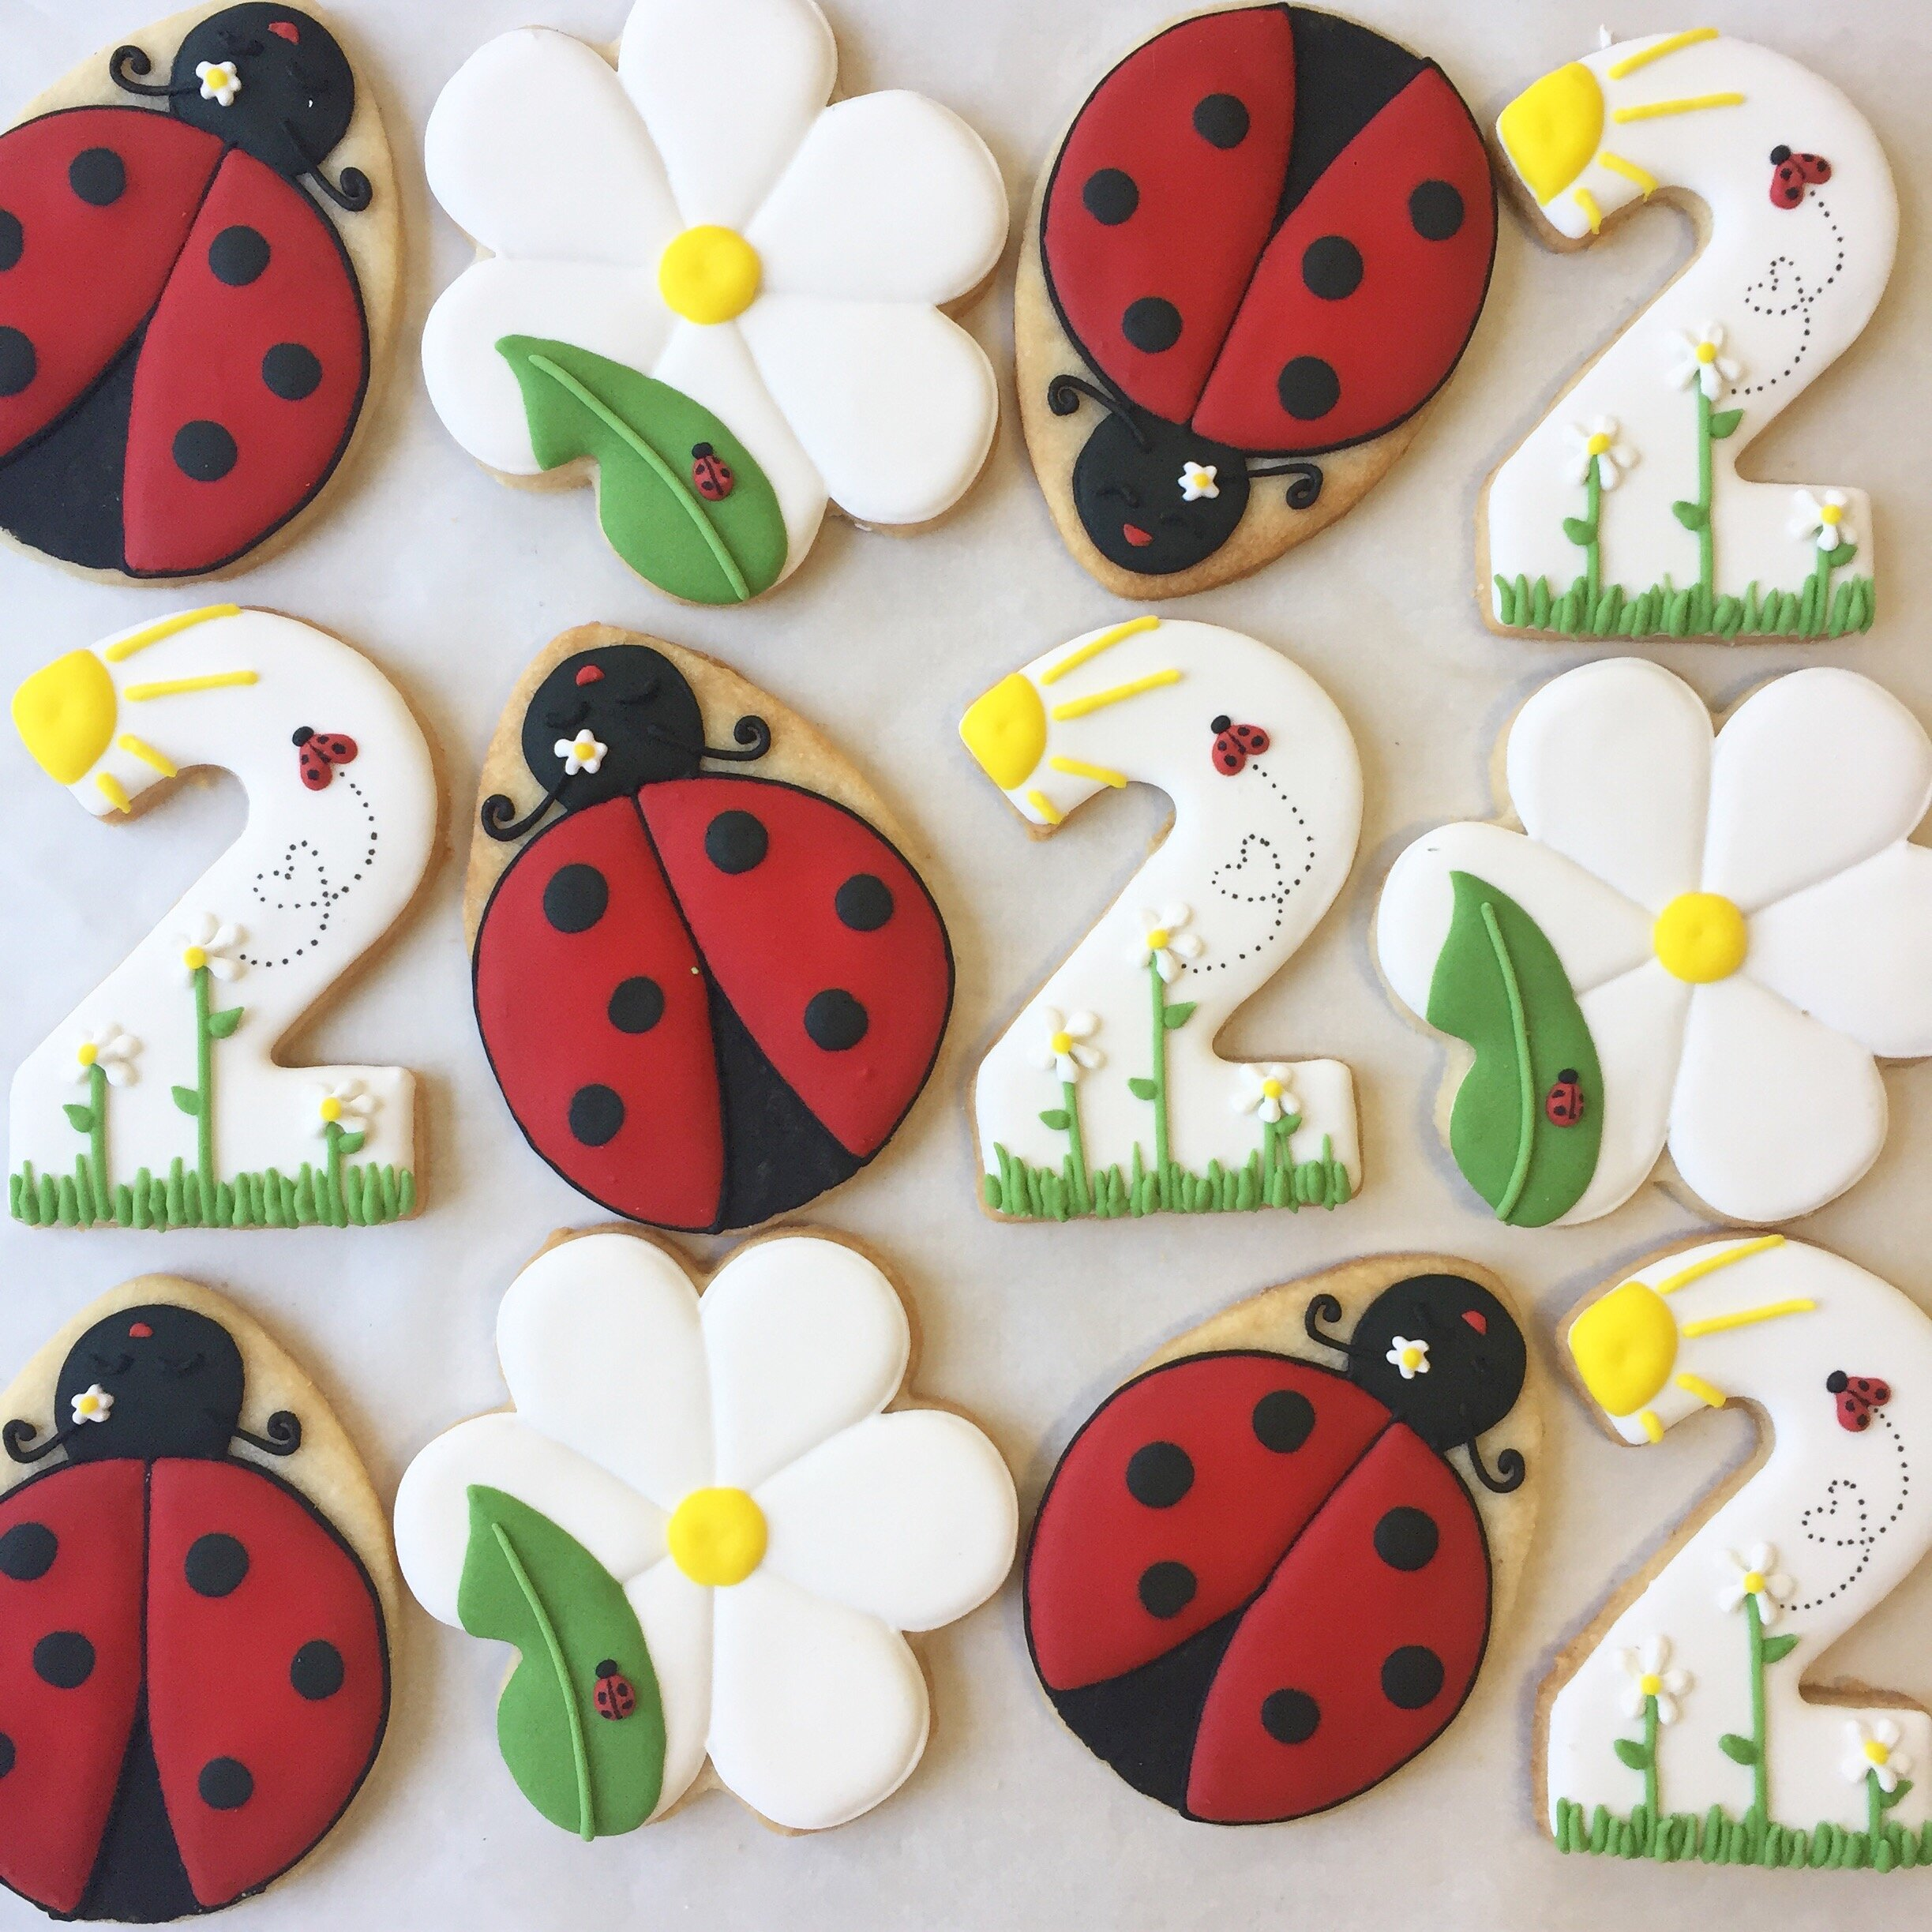 ladybug_B1BEB2AB-1FFD-4CCB-841E-8BB64EC799BB.jpg